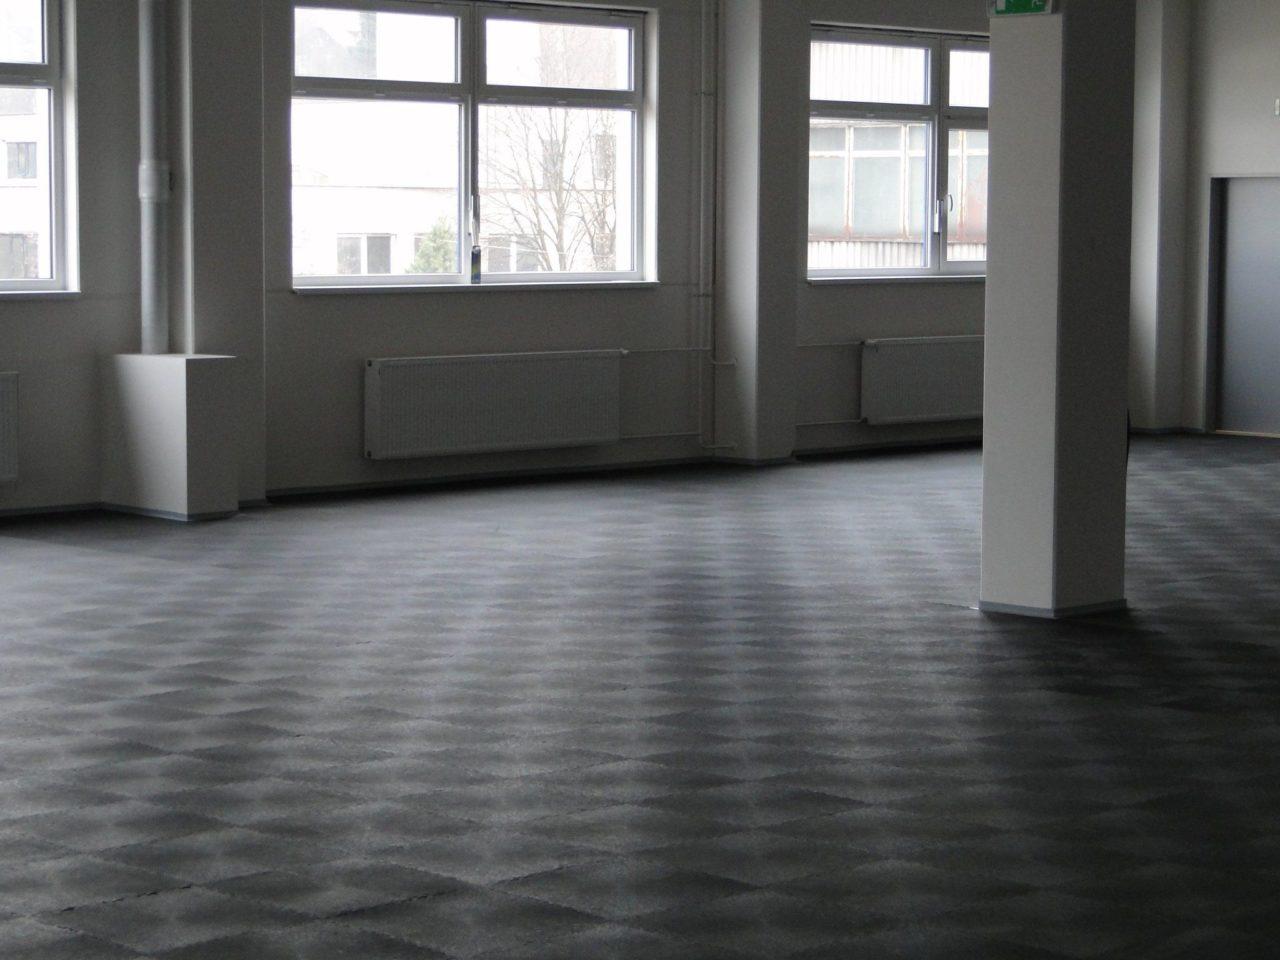 Bevorzugt PVC Industrieboden & Industriefußboden fugenlos als BL88